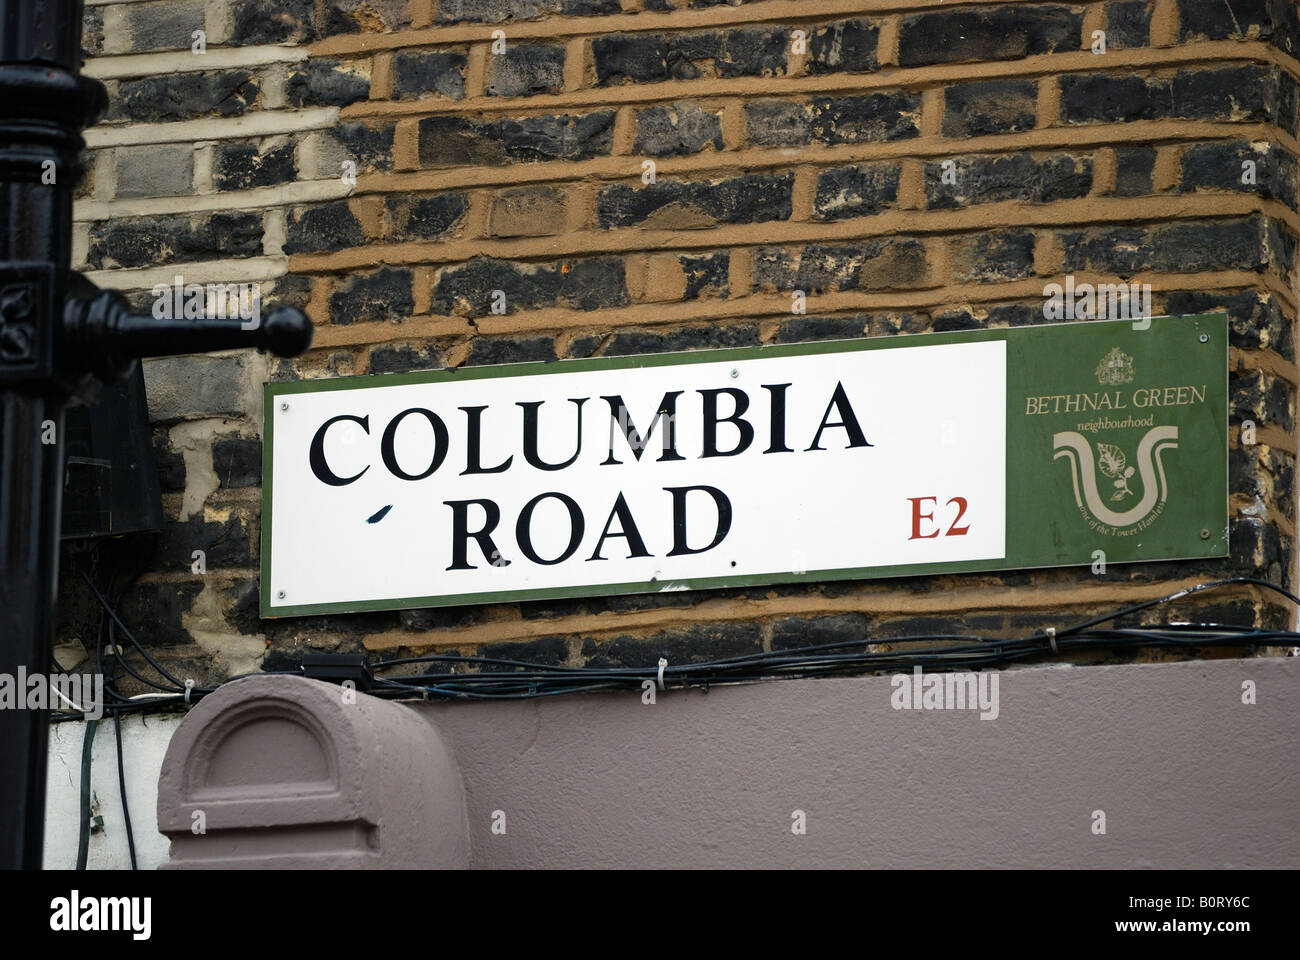 STREET SIGN ON BRICK WALL COLUMBIA ROAD MARKET EAST LONDON - Stock Image